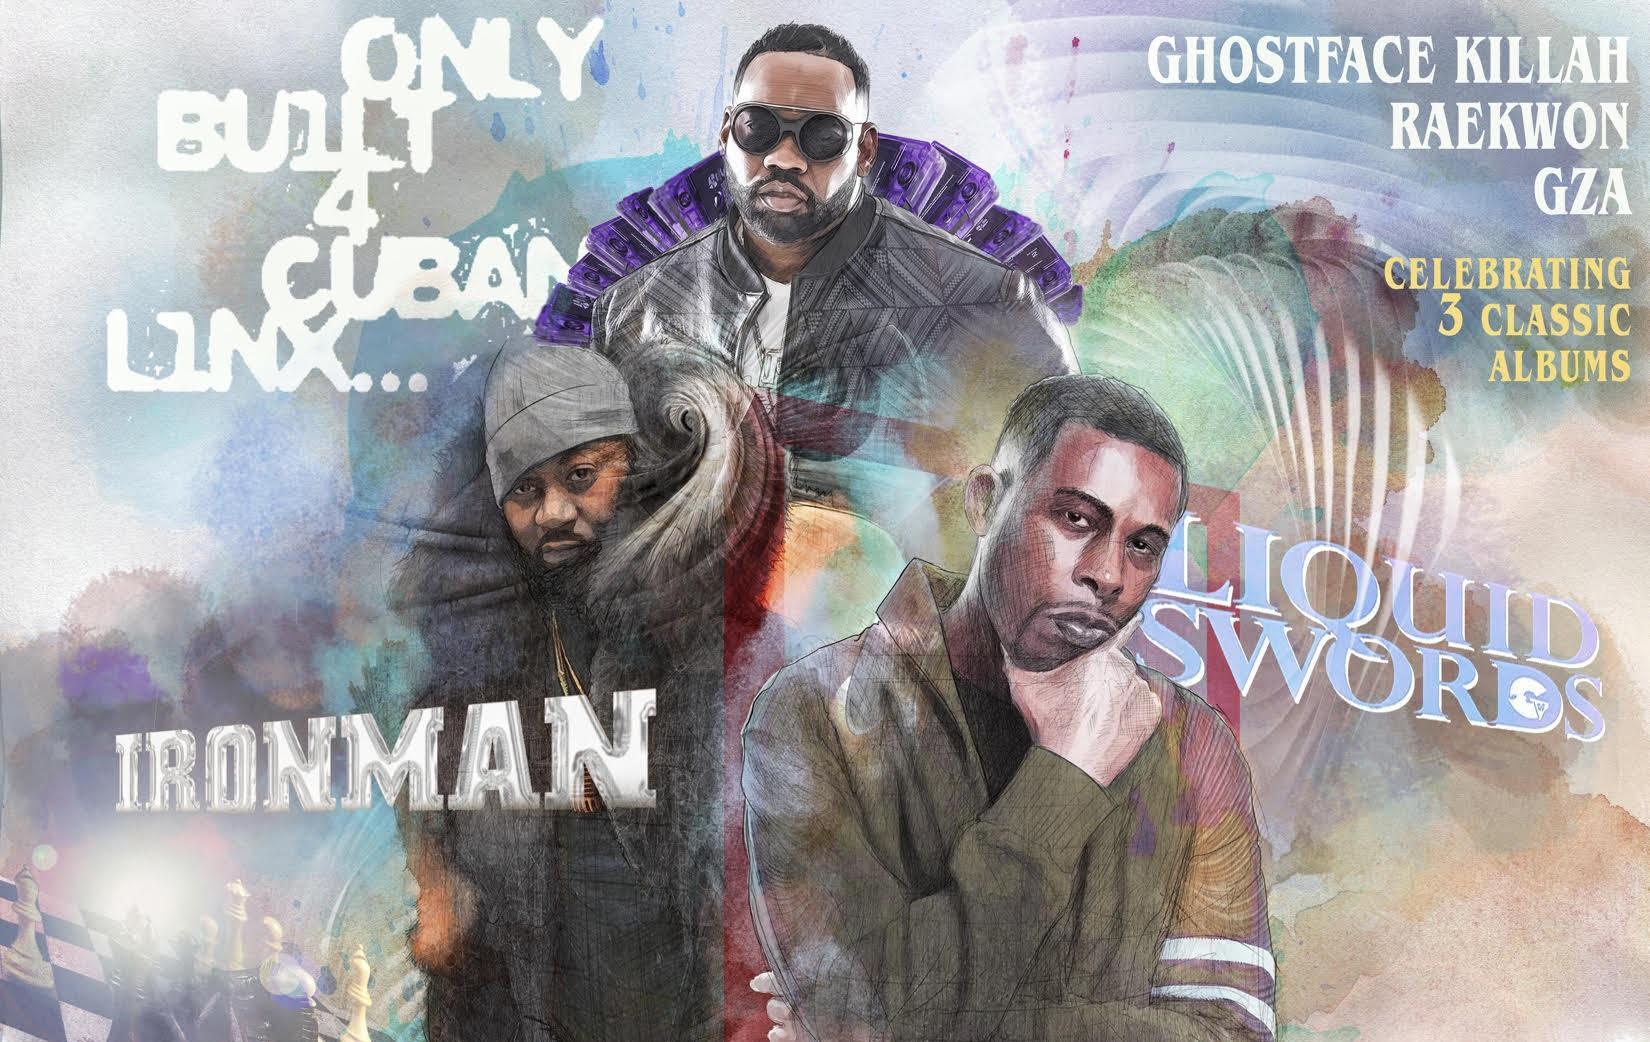 GZA, Raekwon and Ghostface Killah announce 'Tour 3 Chambers'